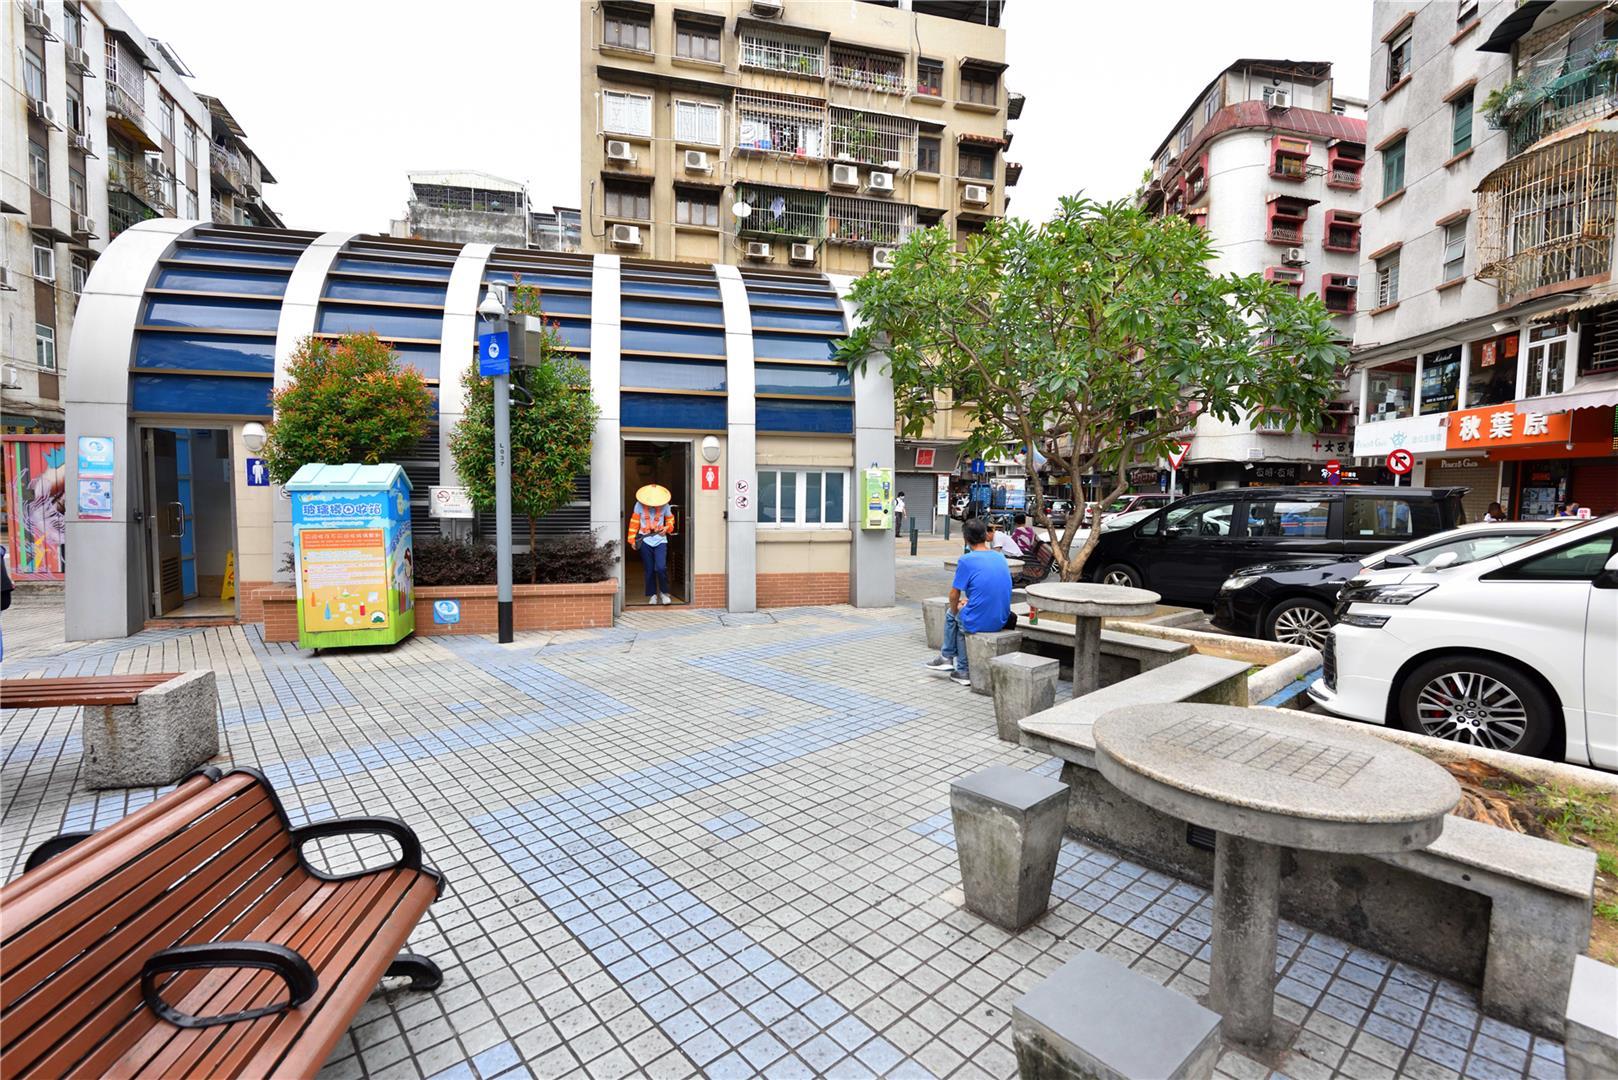 Leisure Area in Rua da Barca